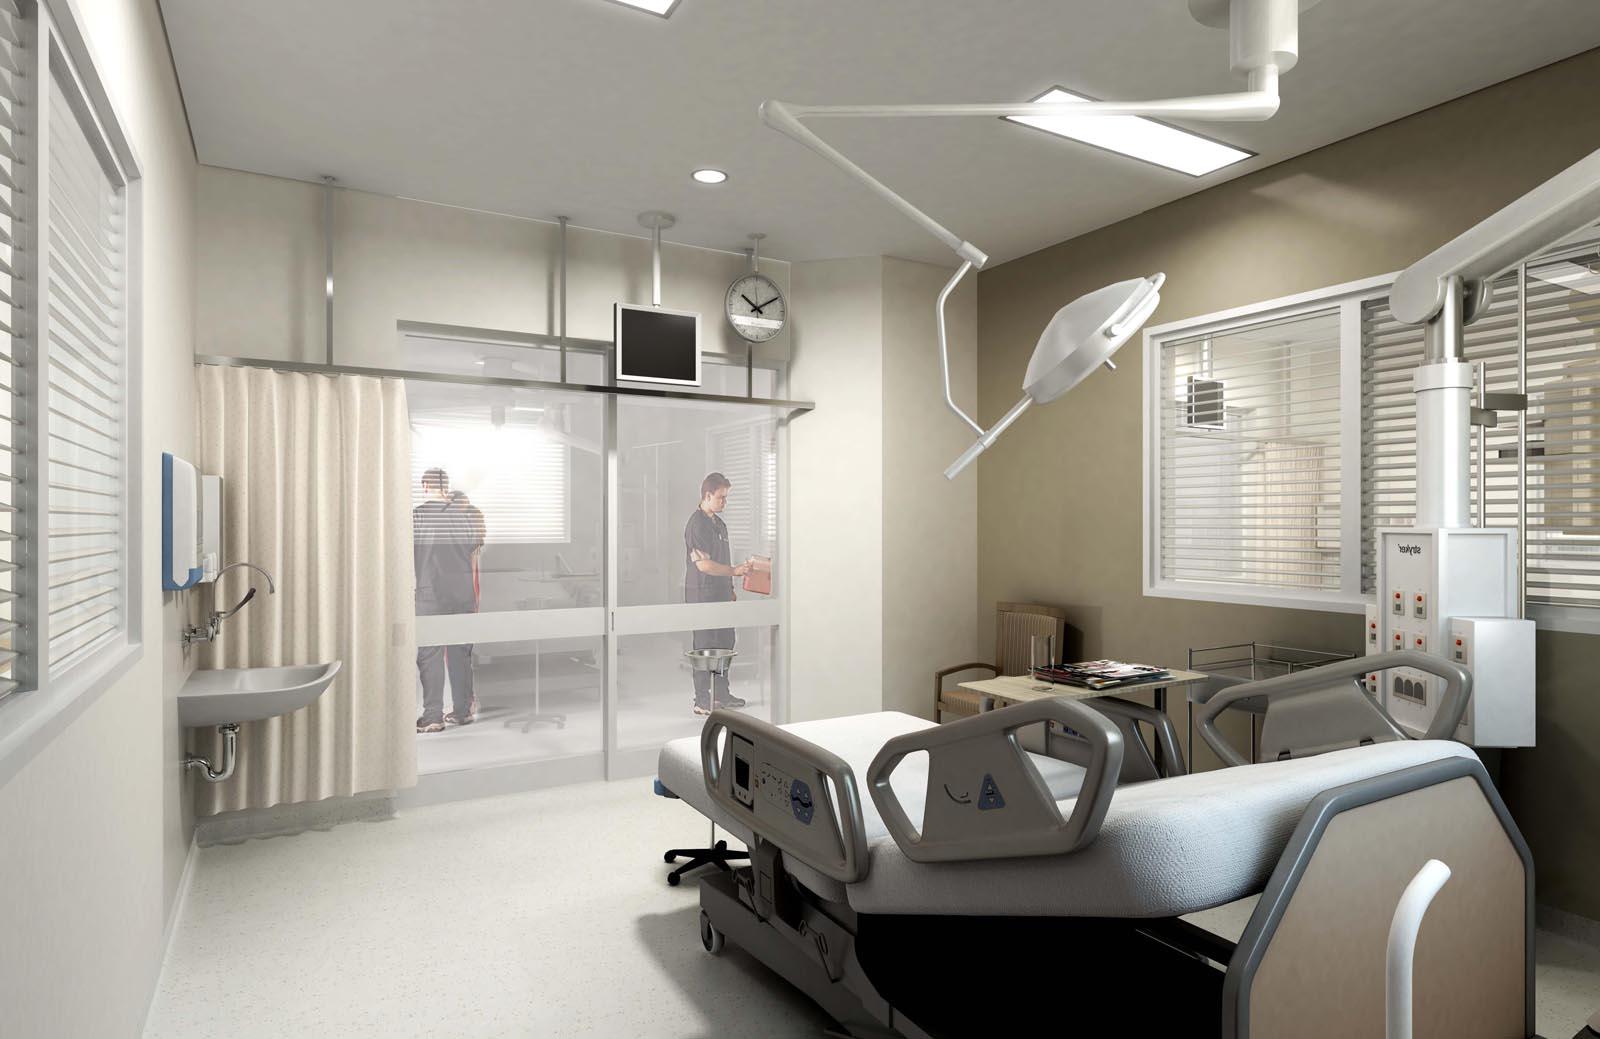 ICU Bedroom rendering